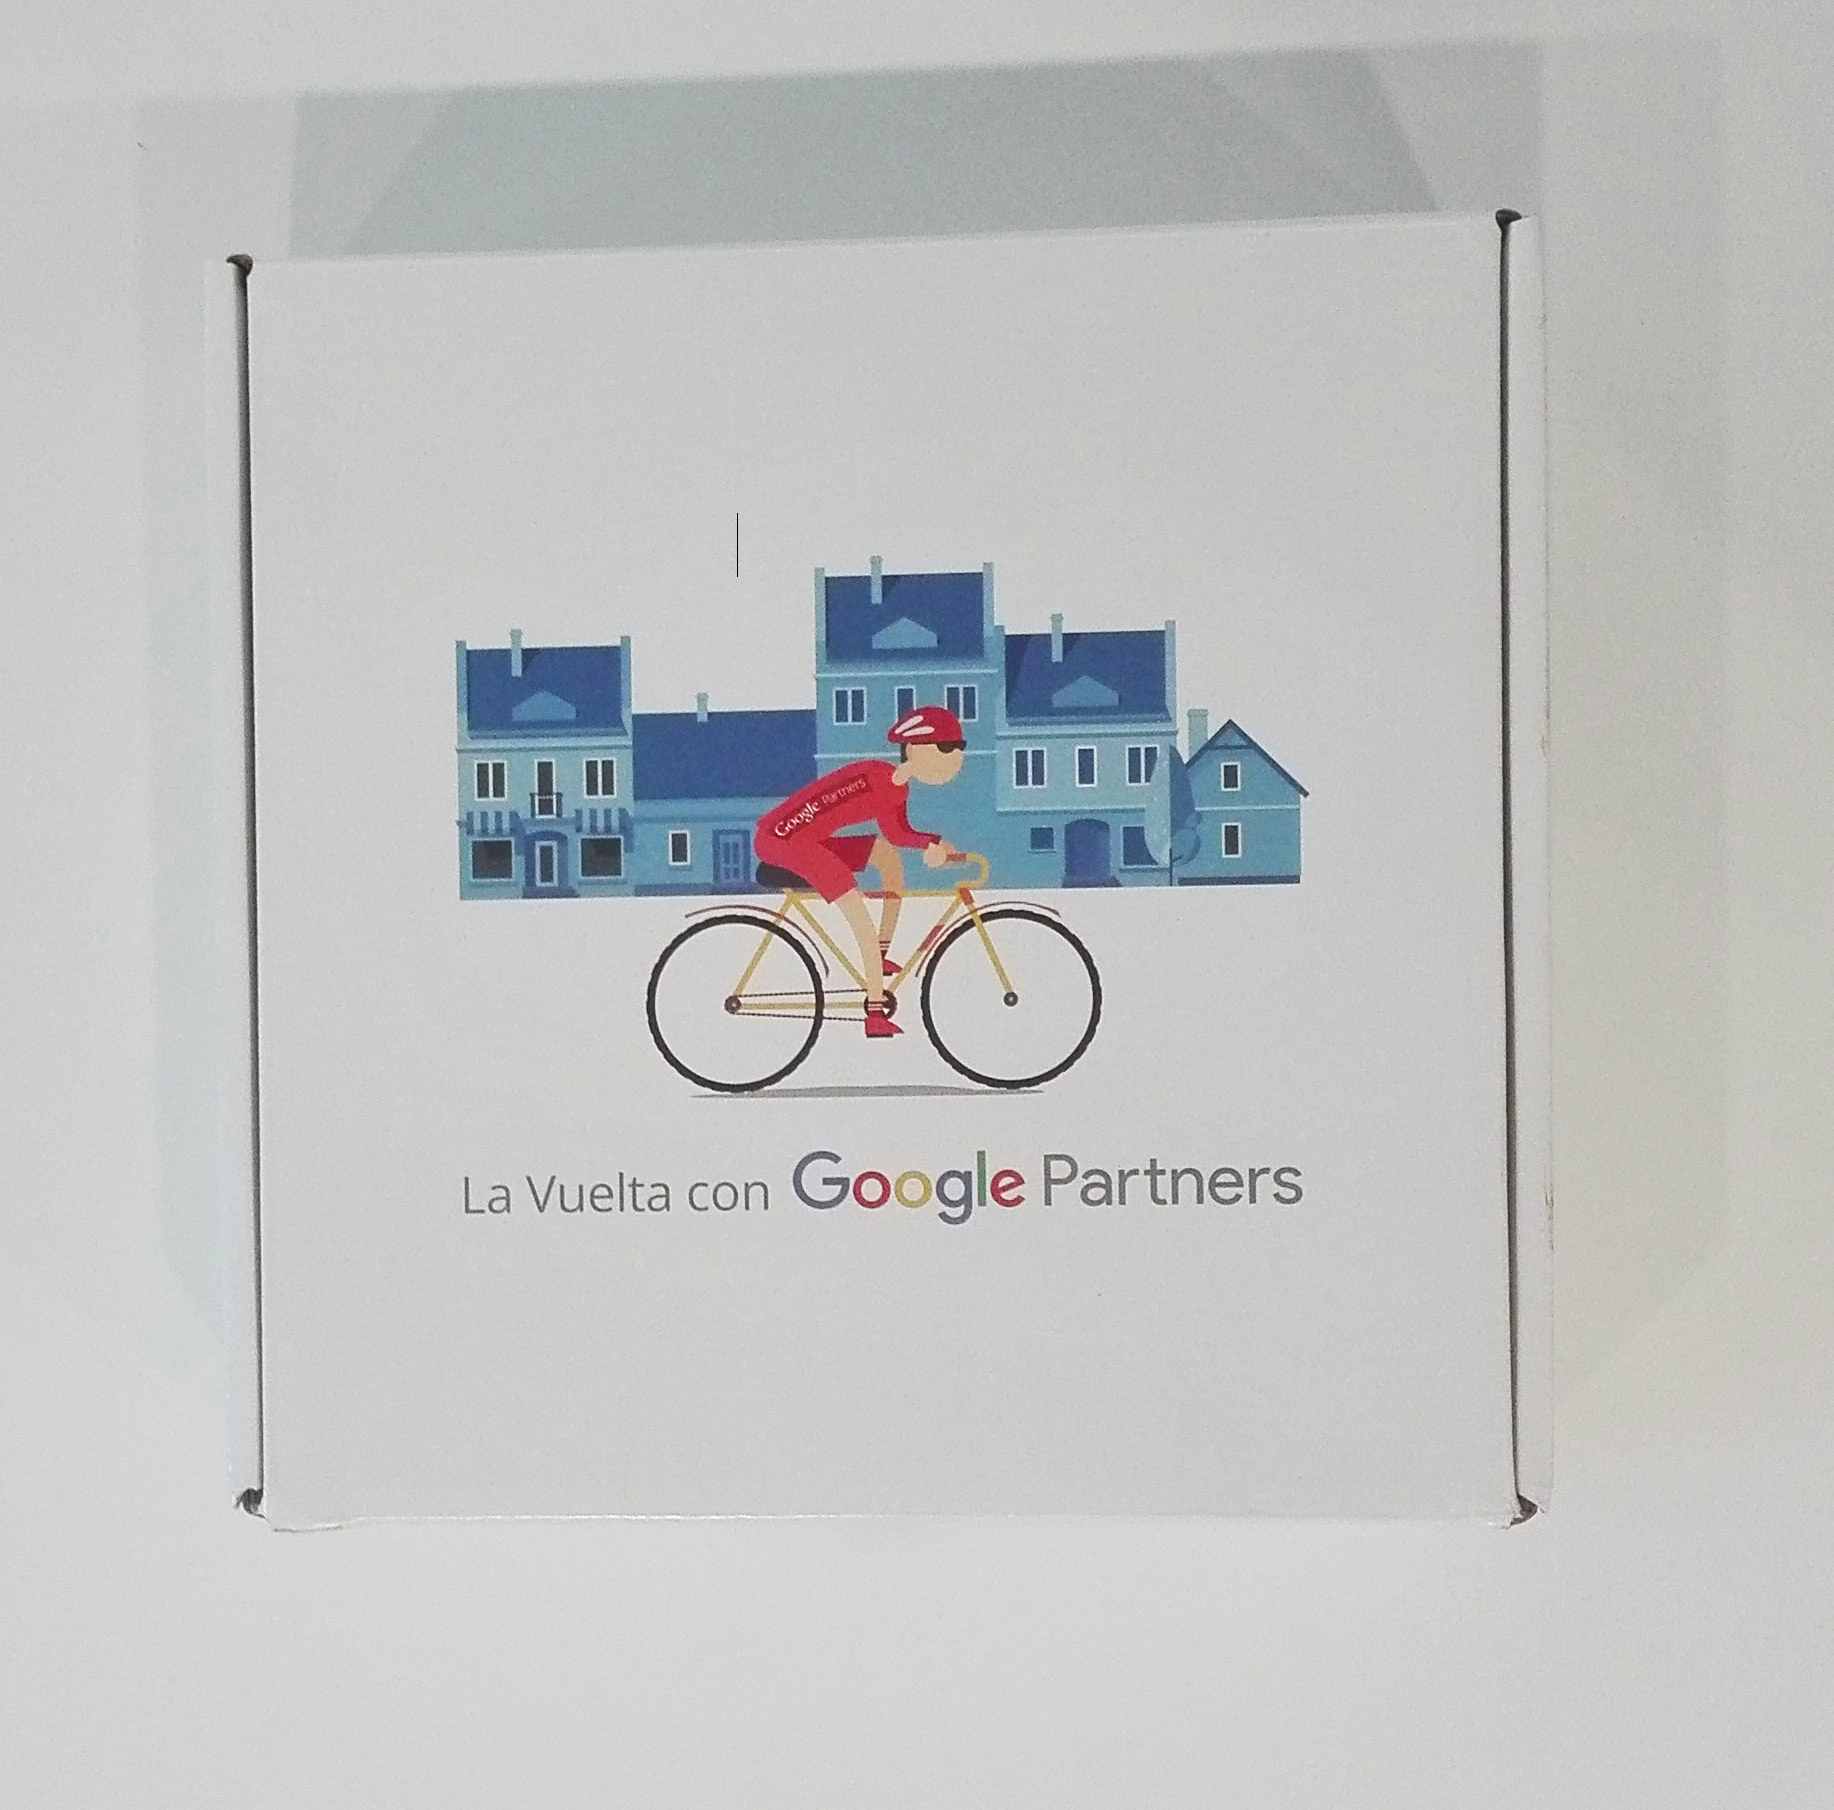 La vuelta con Google Partners llega a Multiplicalia